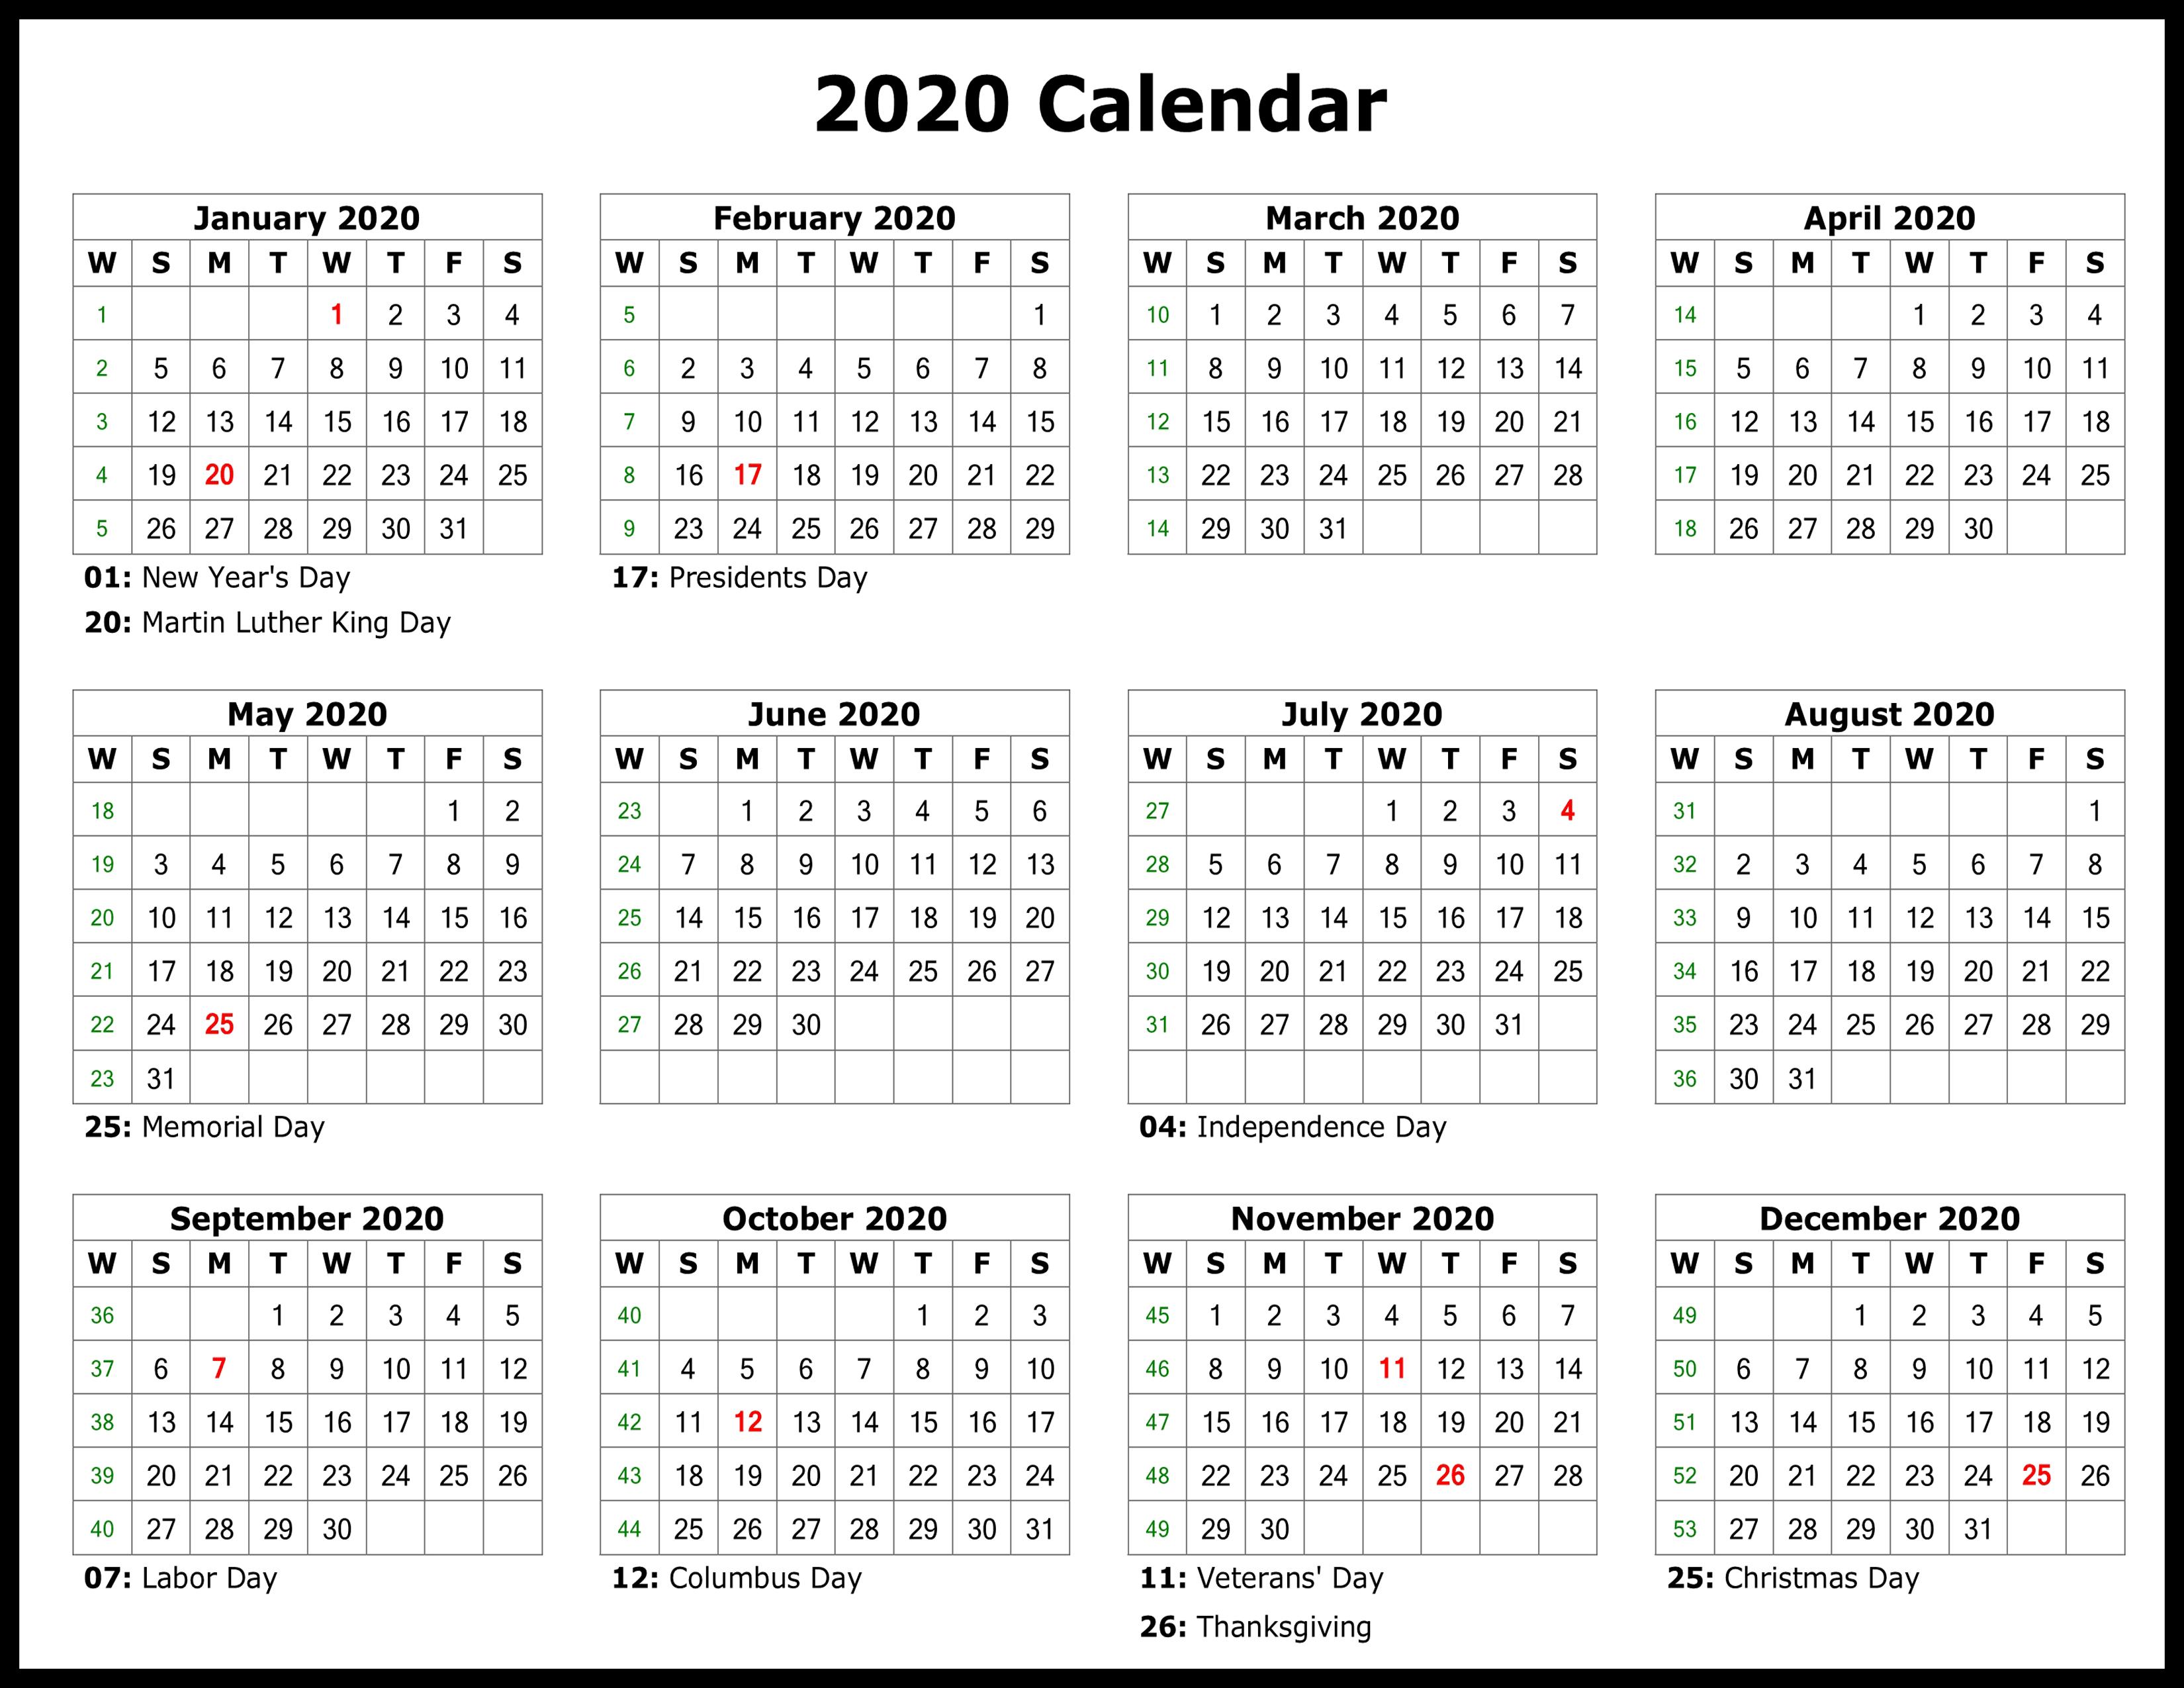 Free 12 Month Calendar 2020 Printable | Printable Calendar